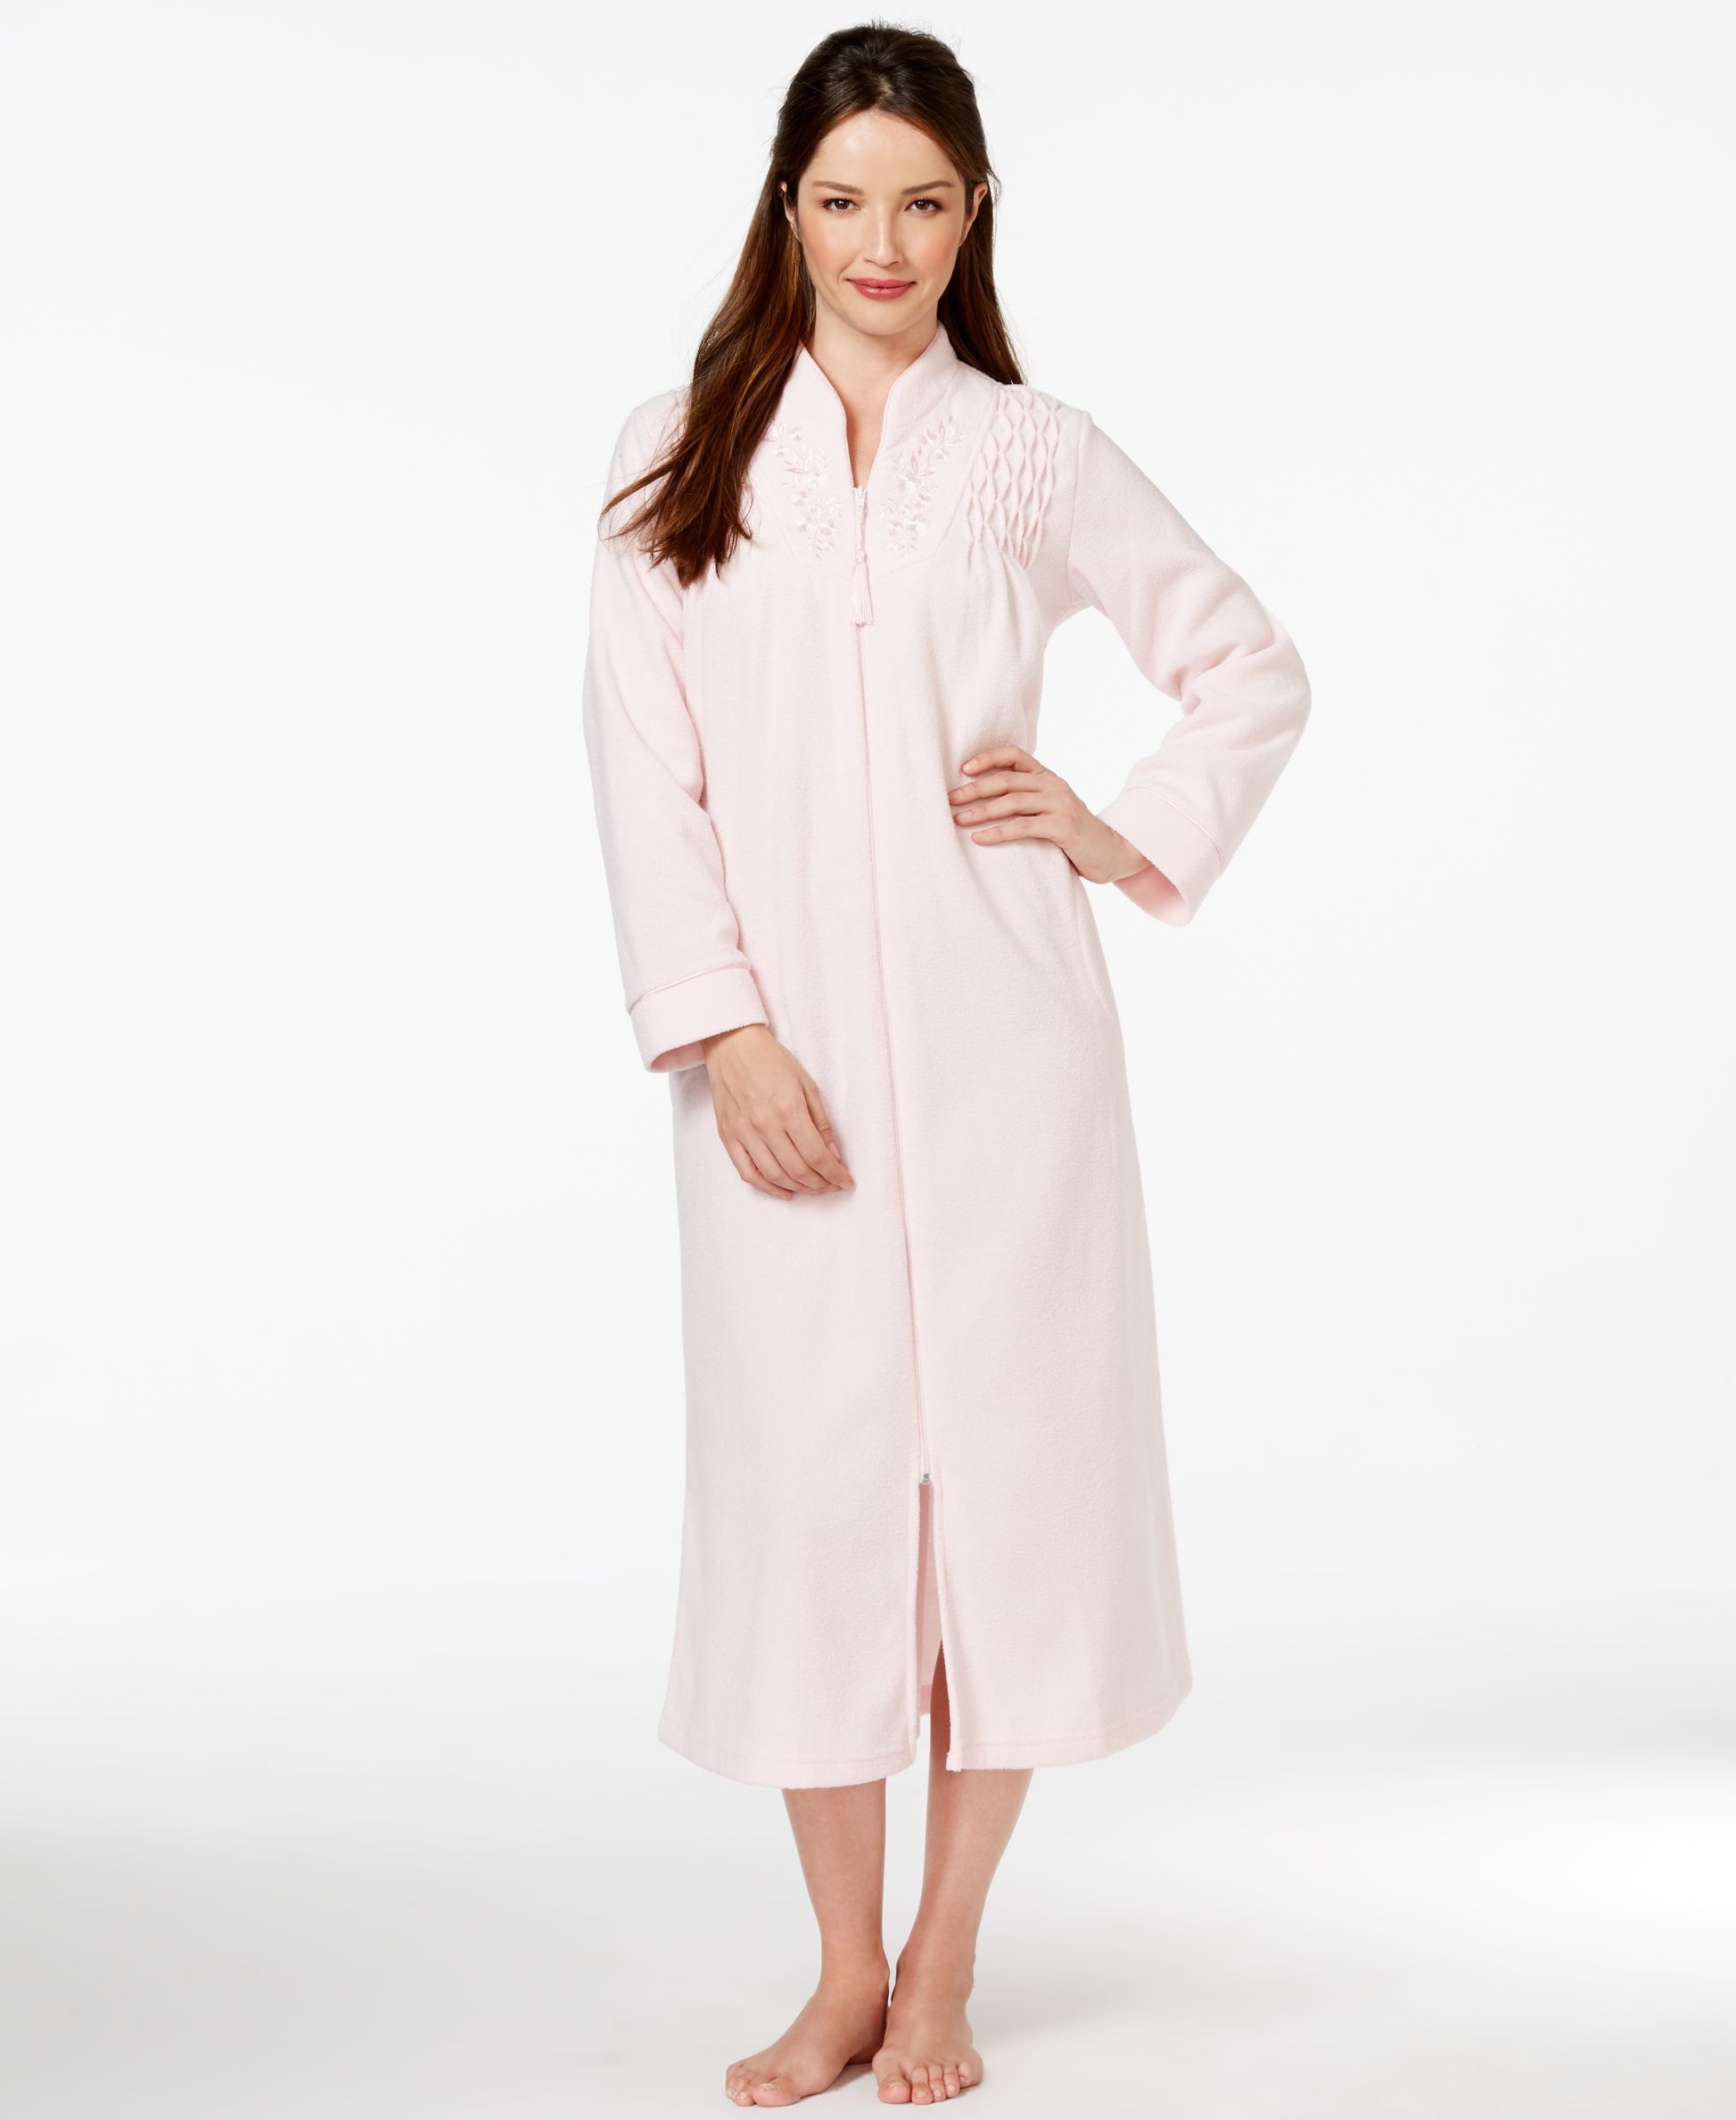 db1b004a7e Miss Elaine Zip Up Long Robe